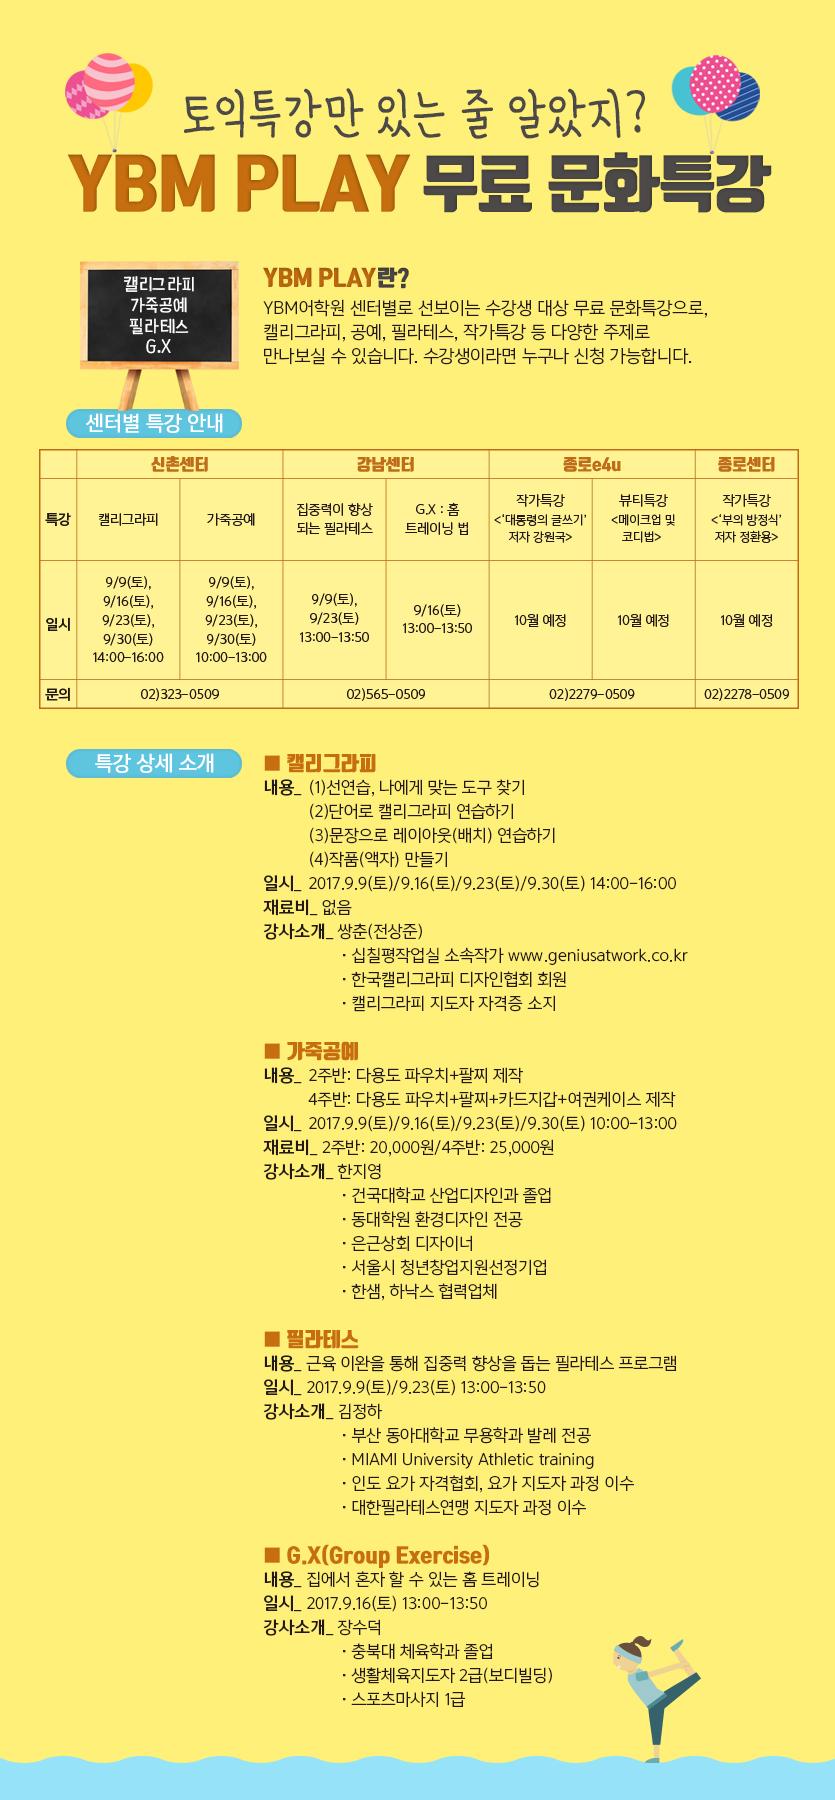 YBM_play 무료특강